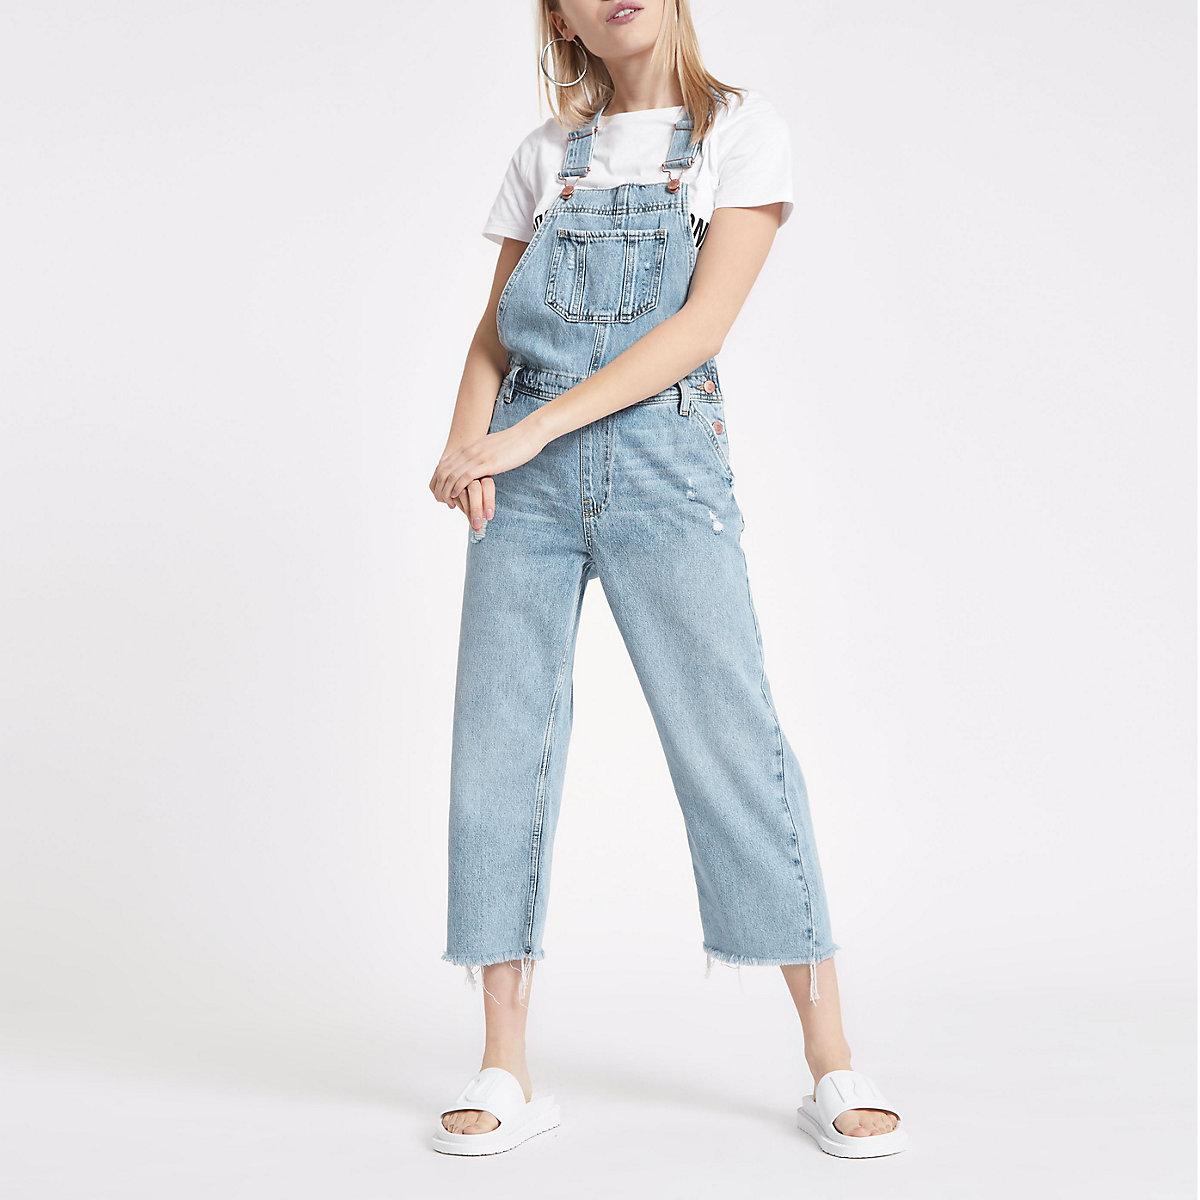 Petite light blue denim overalls